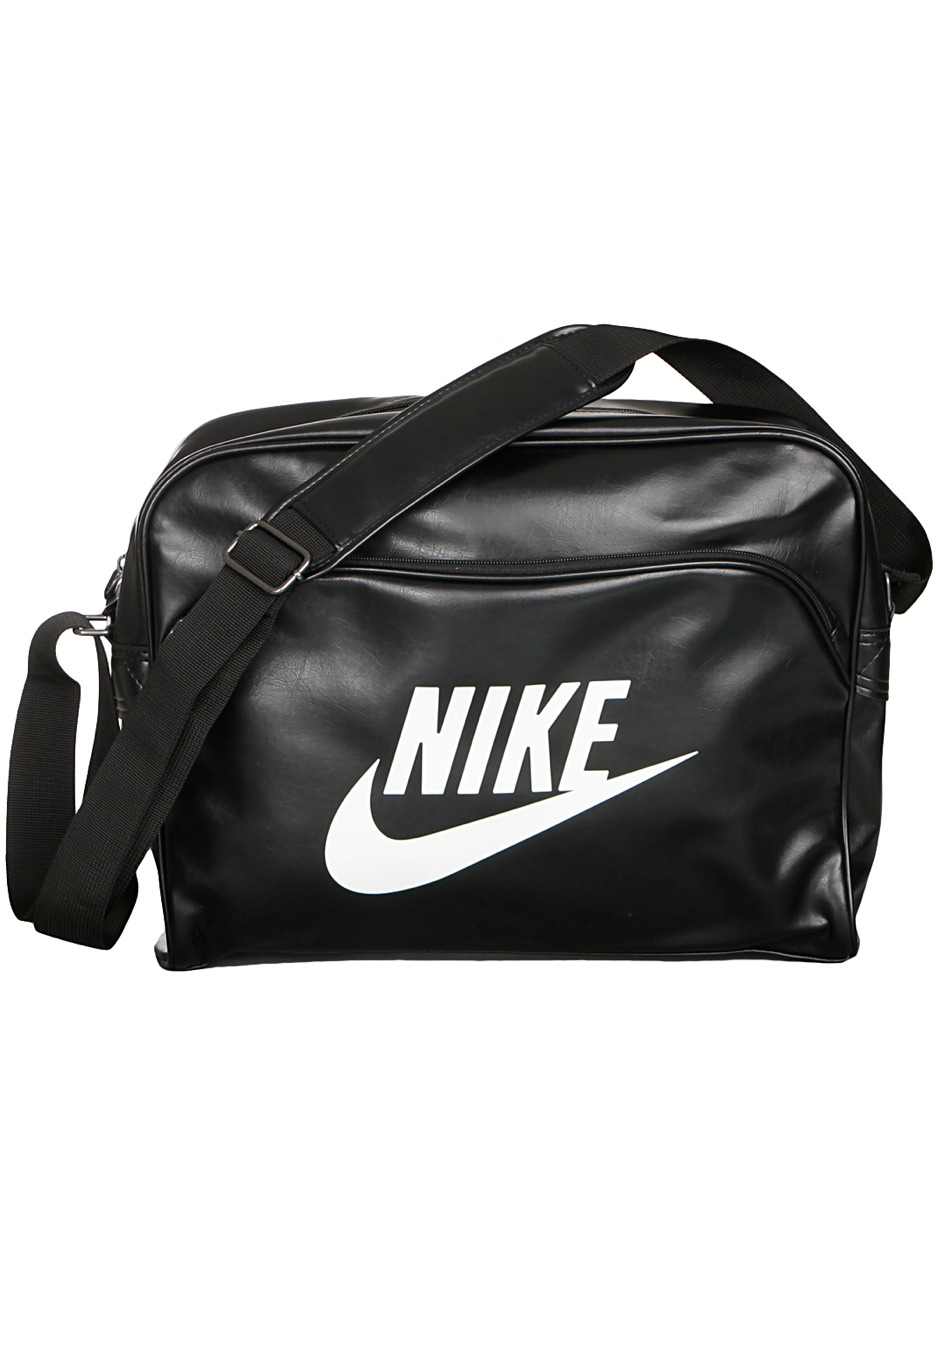 Nike - Heritage SI Track Black Sail - Bolsa - Tienda de marcas -  Impericon.com ES 7ed4acd5cb8eb